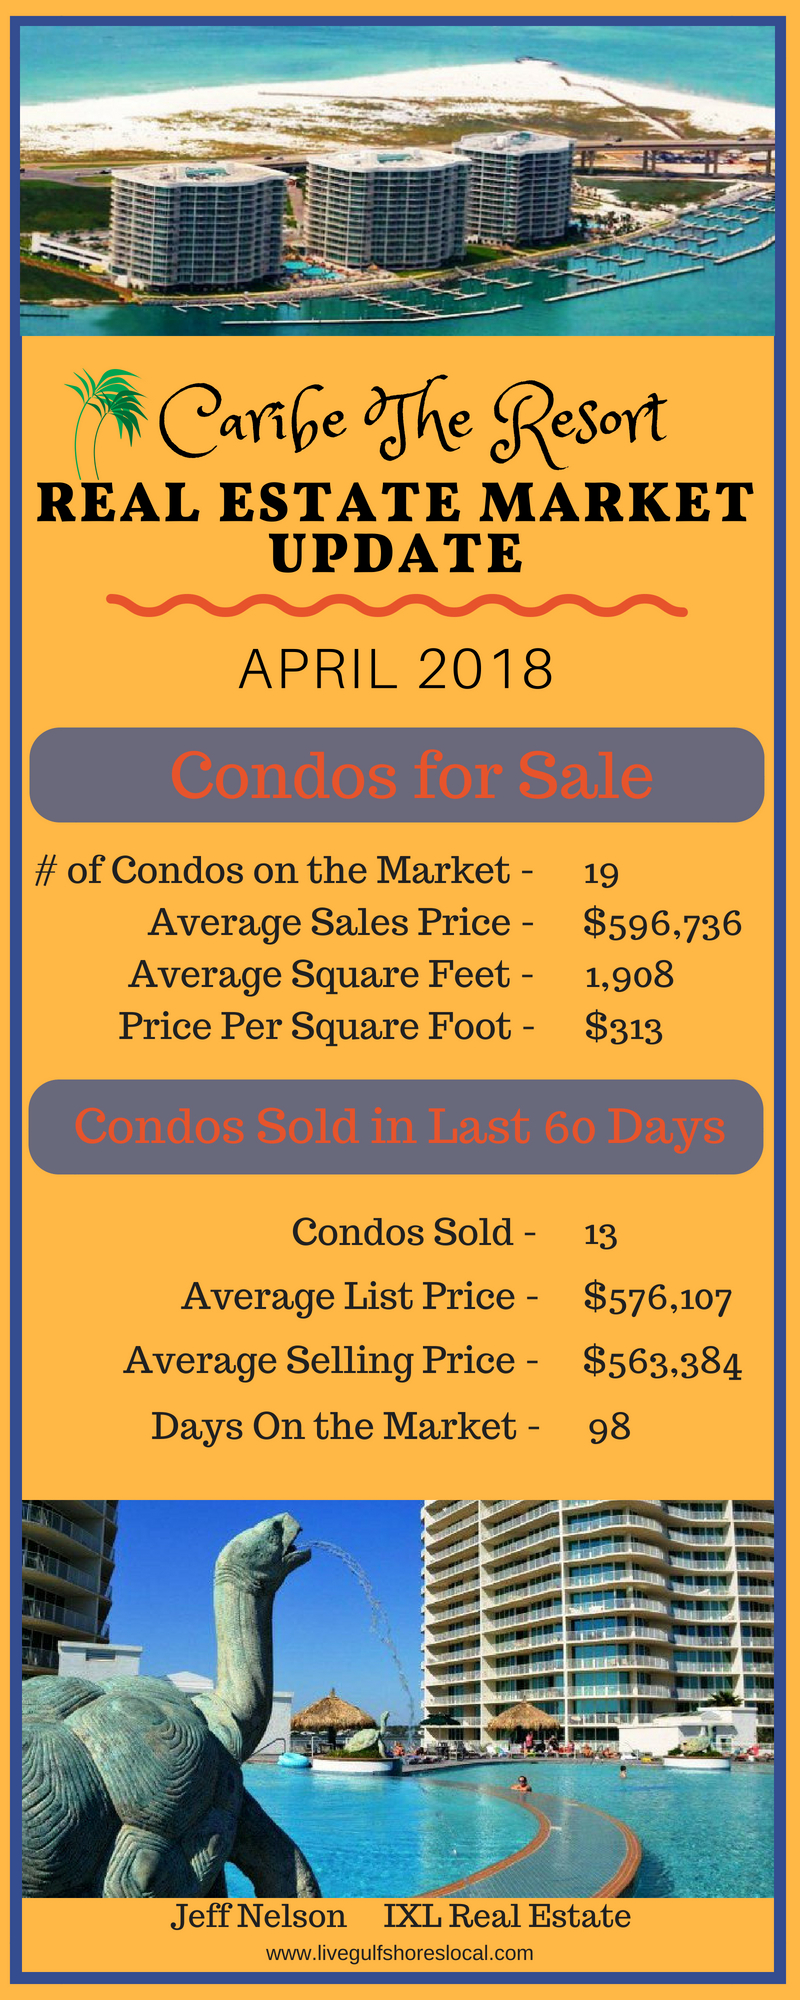 Caribe Resort Real Estate Market Update - April 2018